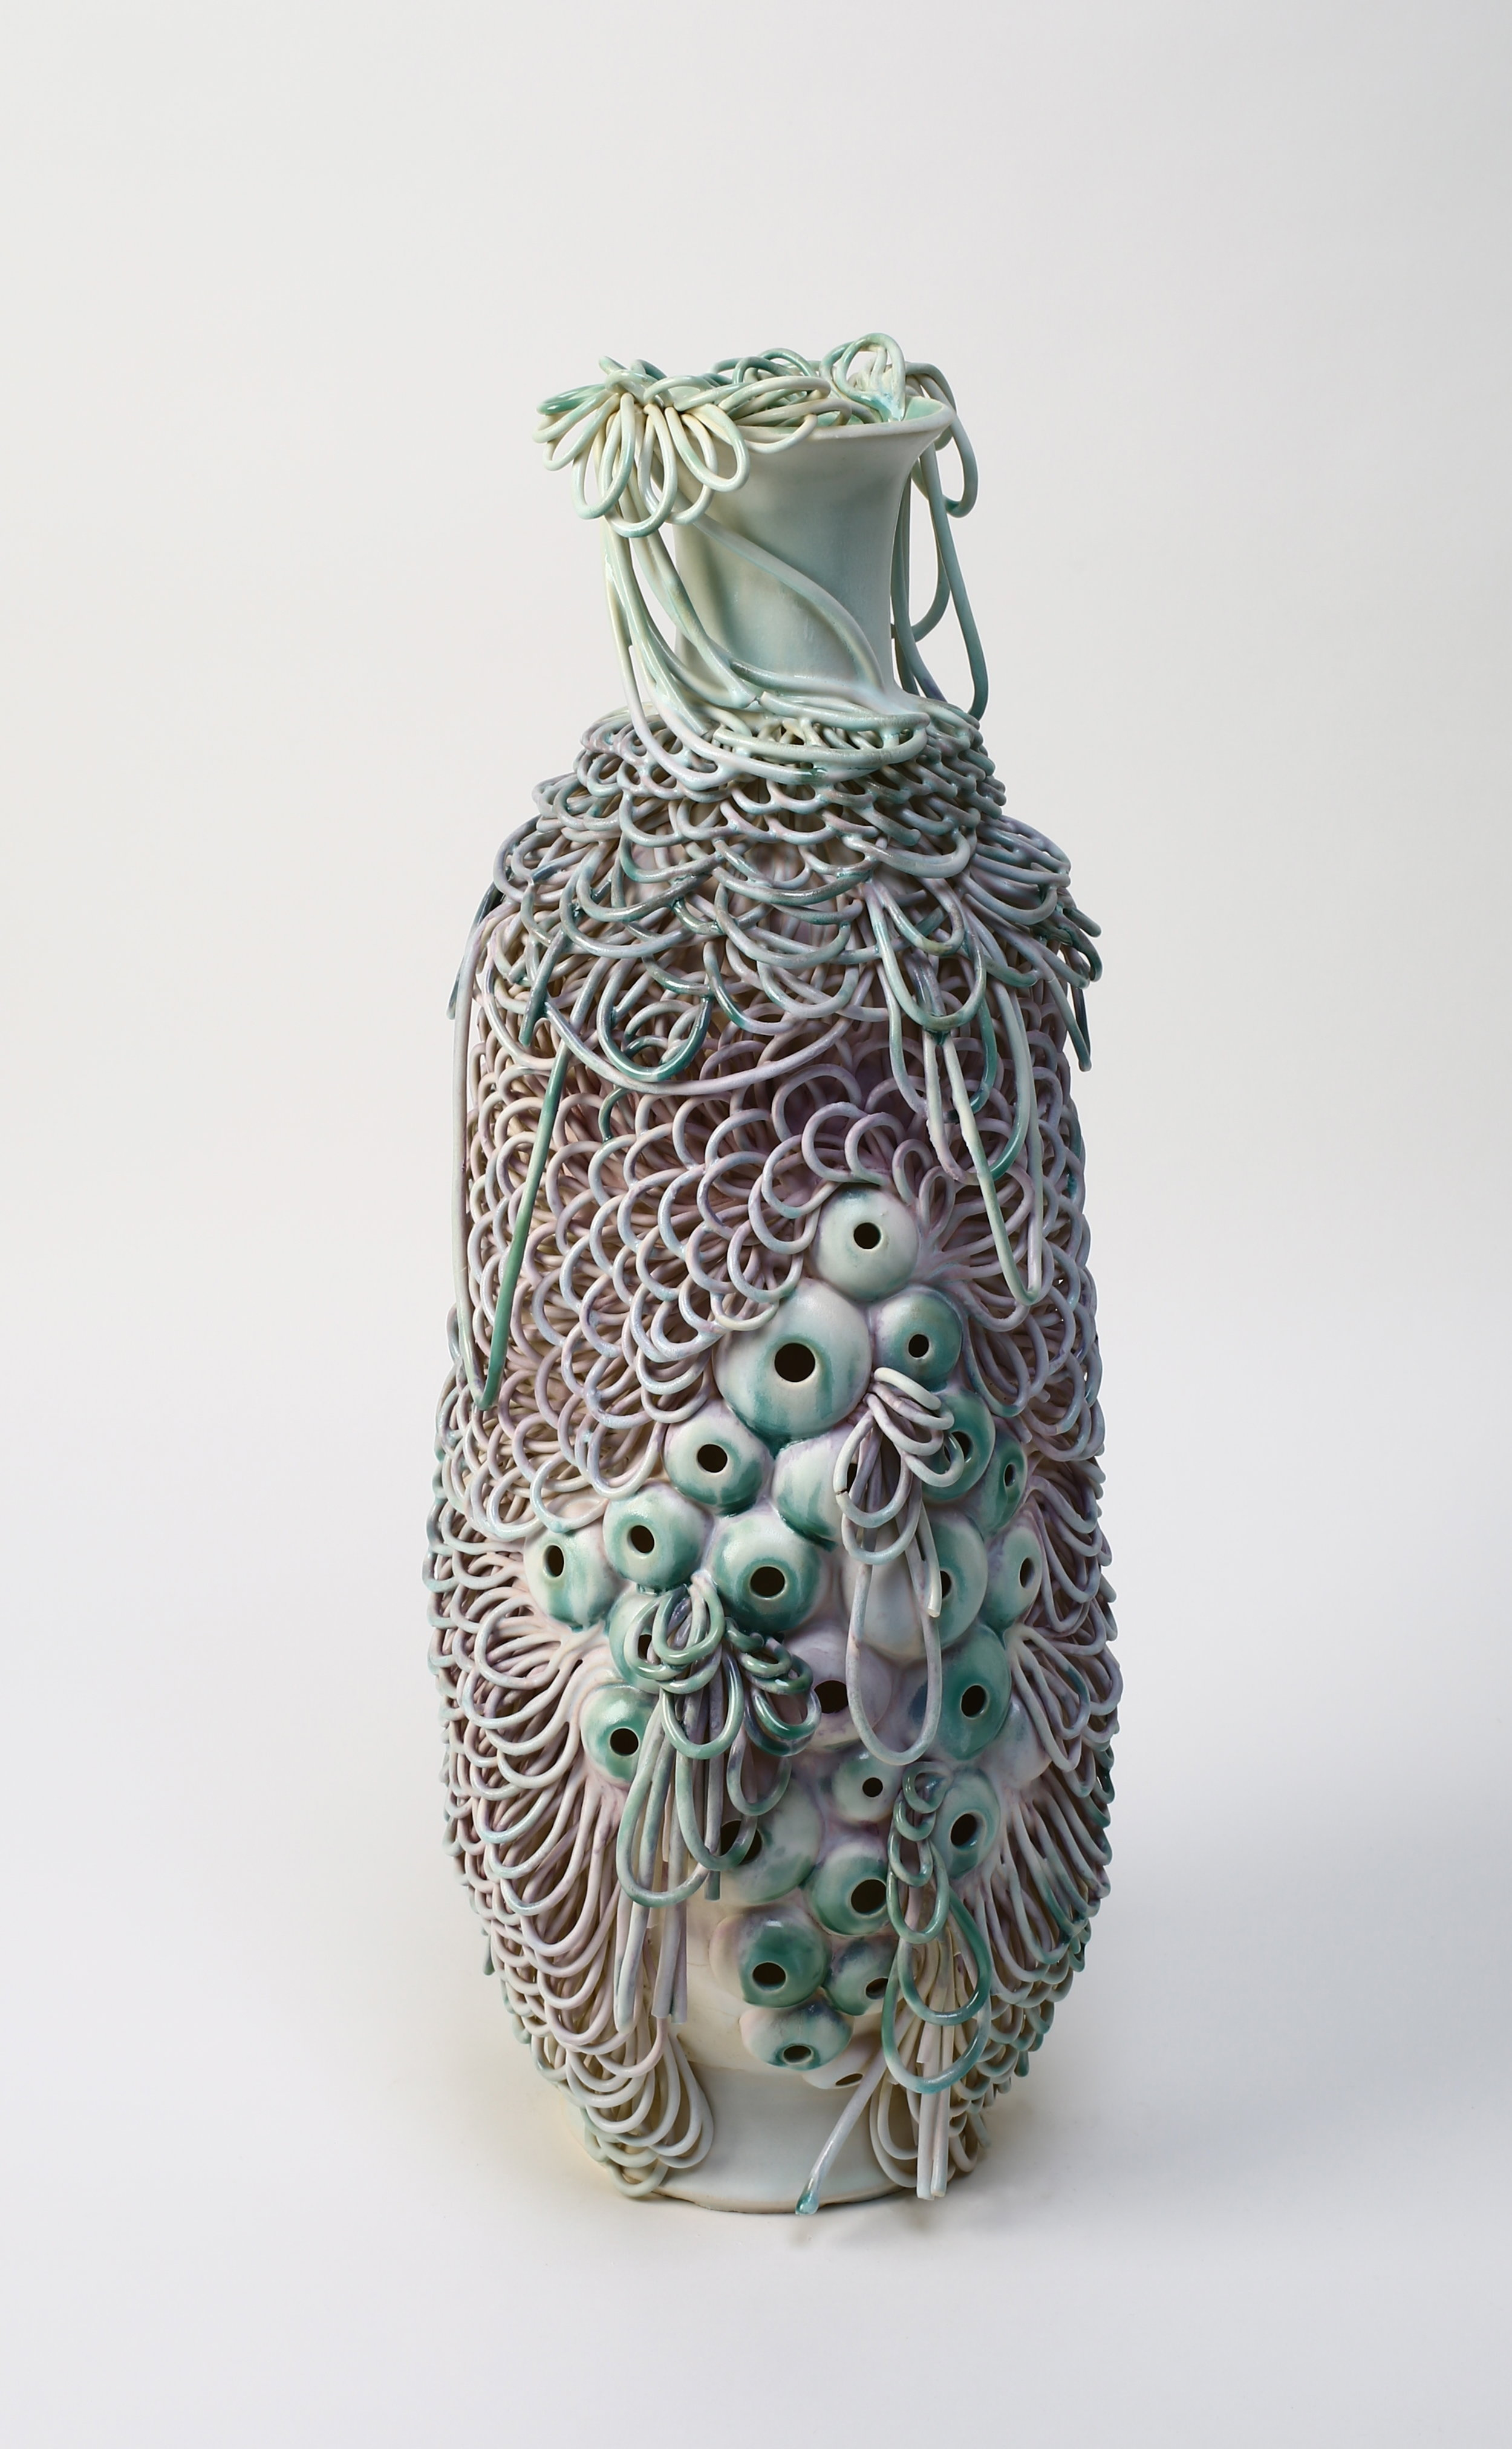 Knit/Purl no. 1